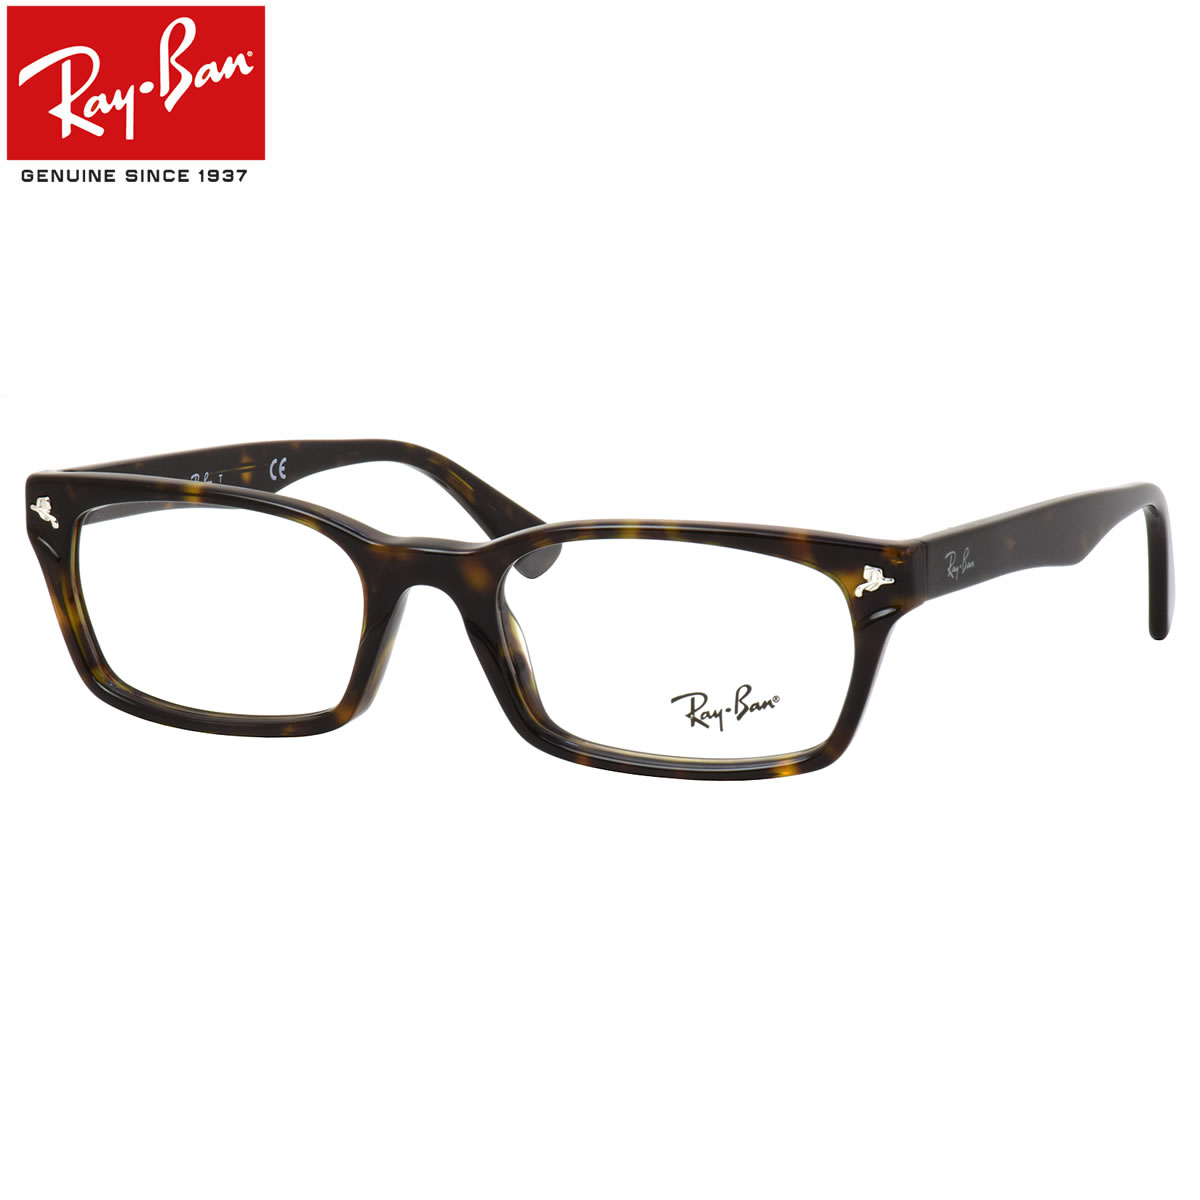 Ray-Ban メガネ 正規商品販売店14時までのご注文なら即日発送可能 ギフトバッグ コンビニ決済手数料無料 RX5017A 2012 メンズ 52 ダークハバナ 市販 レイバン 人気の製品 レディース 度数付き対応